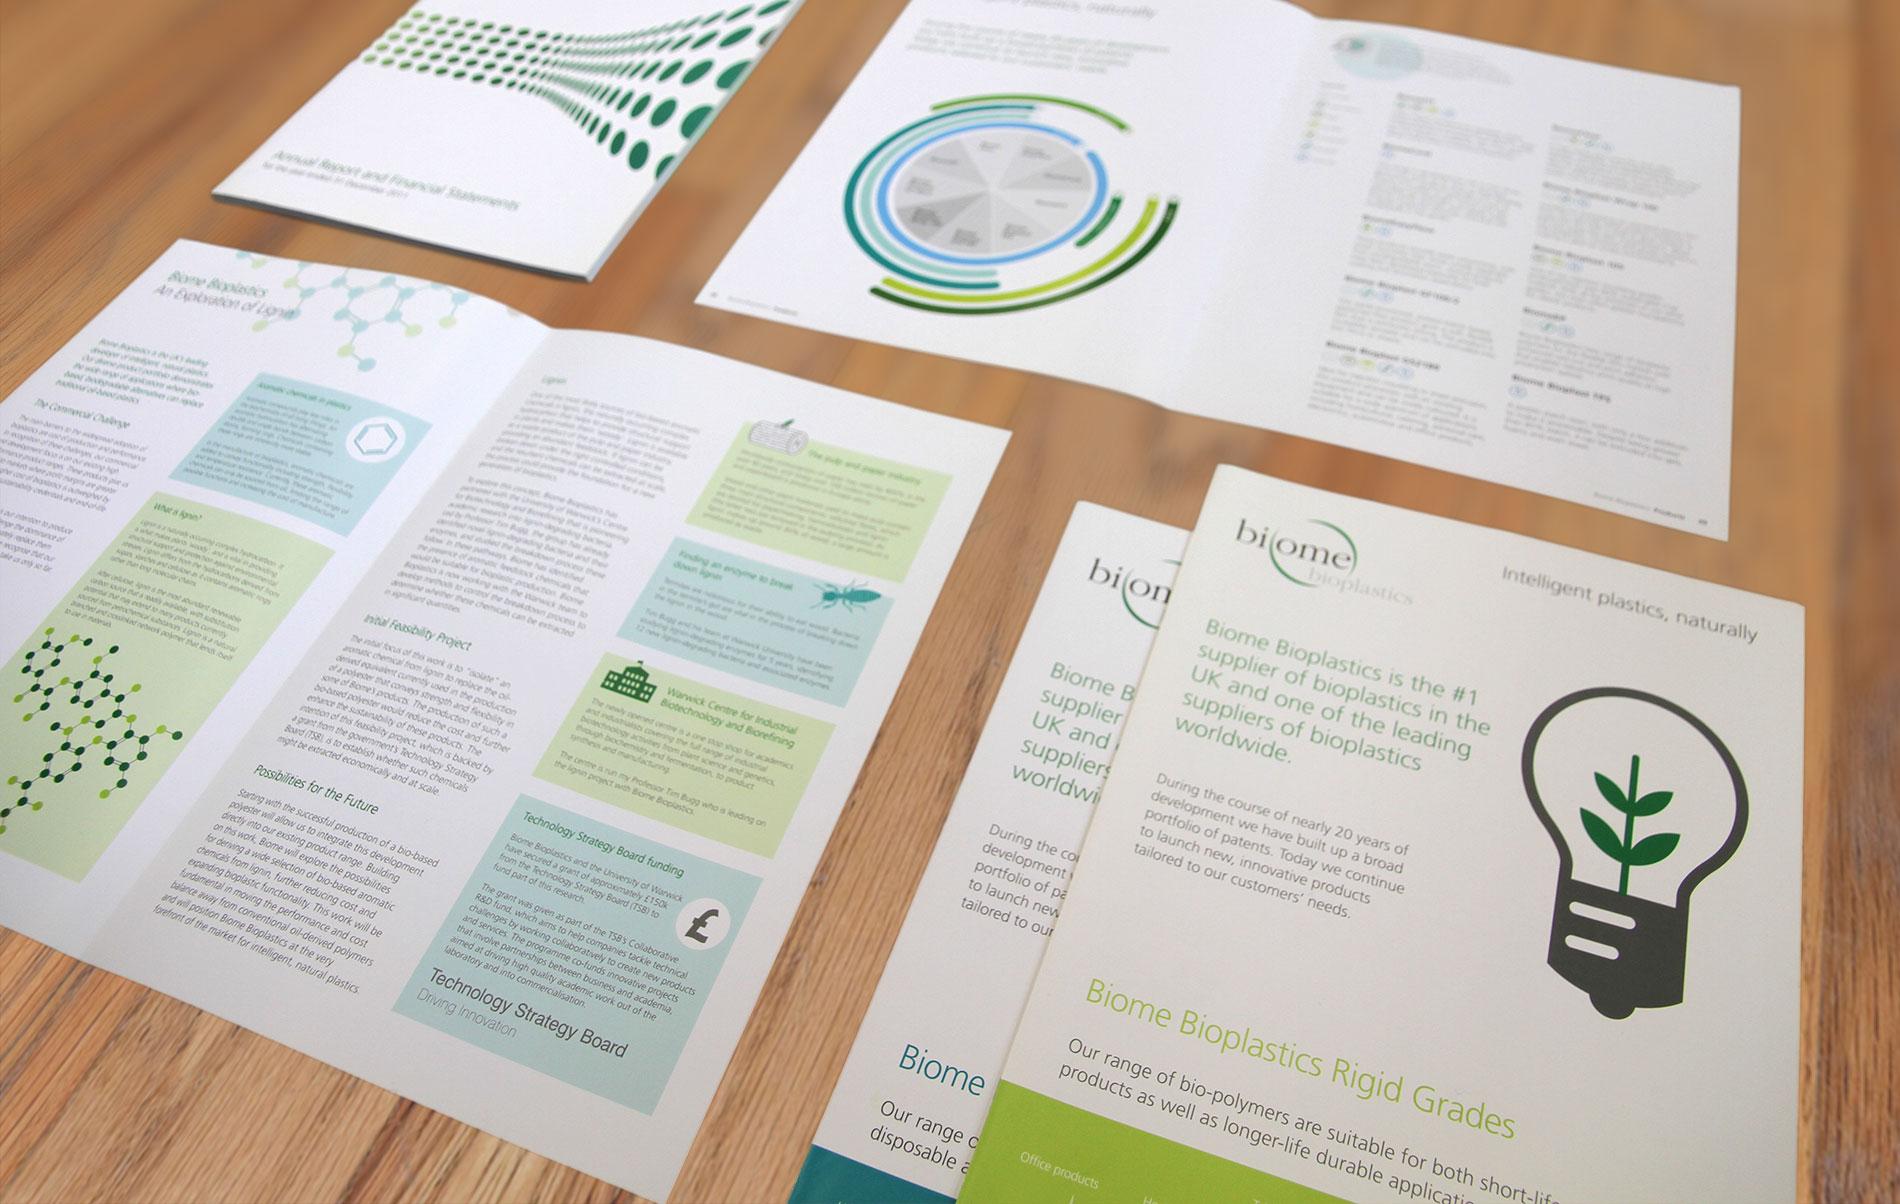 Full Marketing Material Brochure for Biome Intelligent Bioplastics & Industry Biotechnology